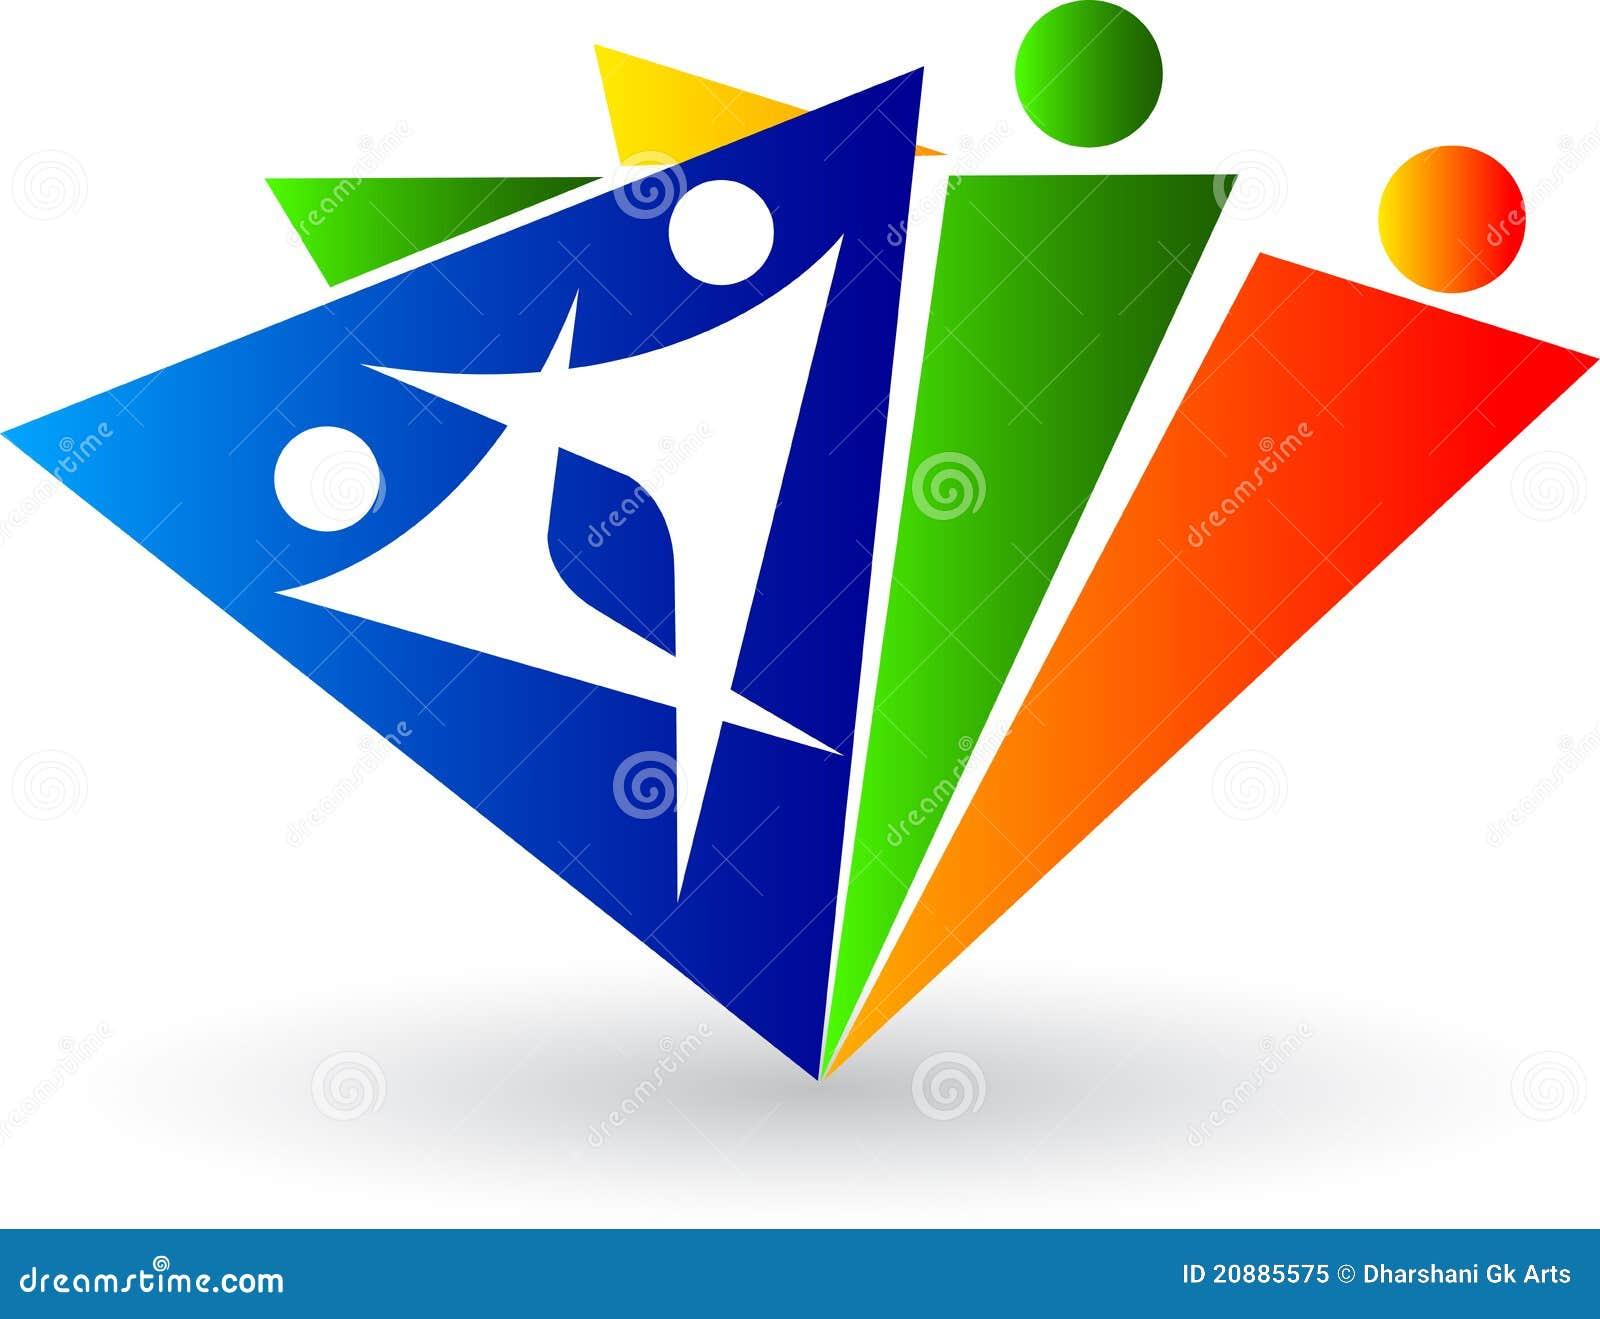 Insignia humana del triángulo